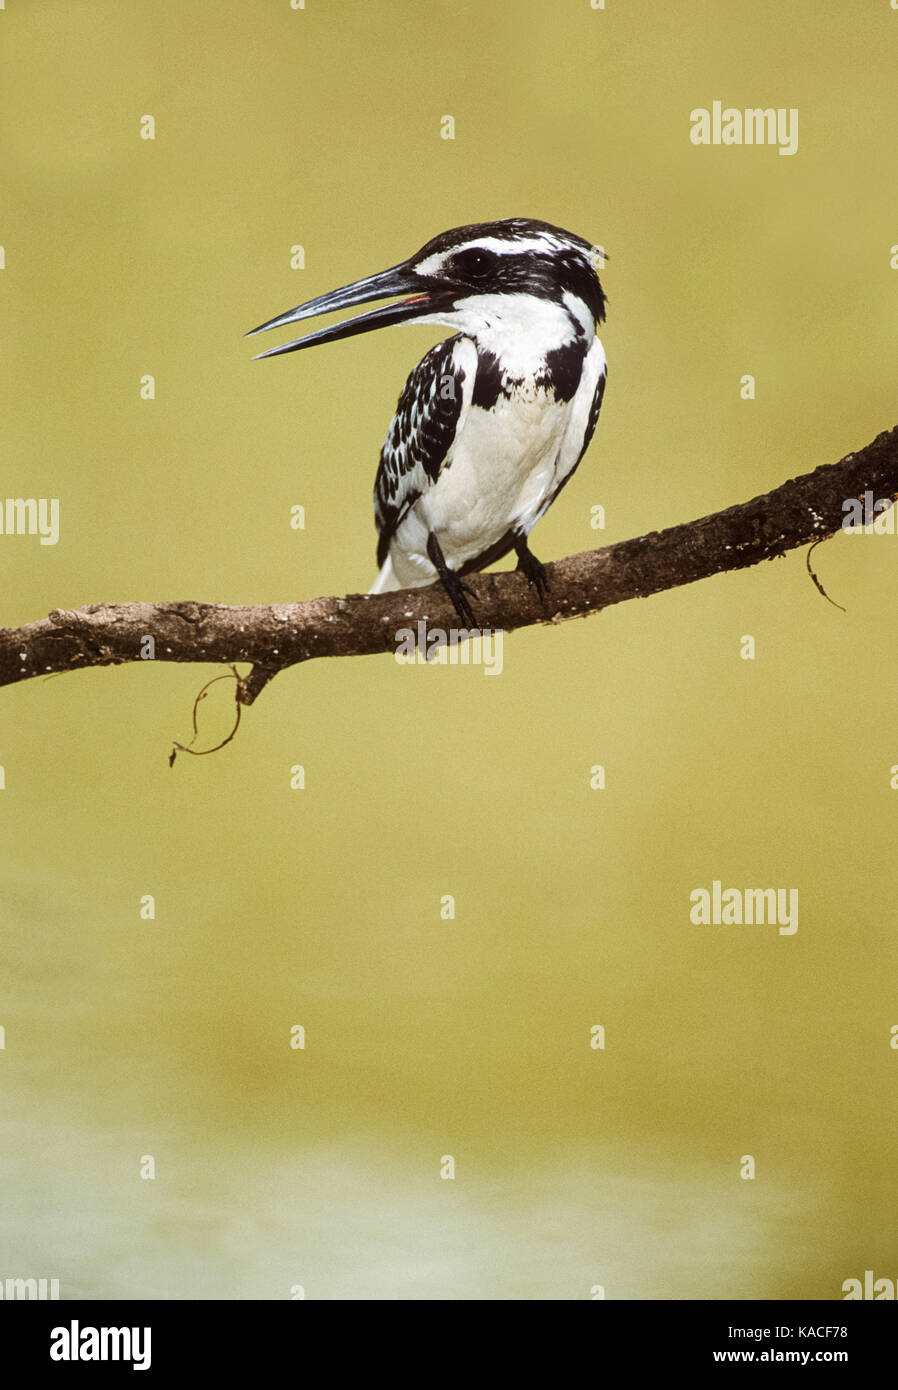 Pied Kingfisher, (Ceryle rudis), Keoladeo Ghana National Park, Bharatpur, Rajasthan, India - Stock Image